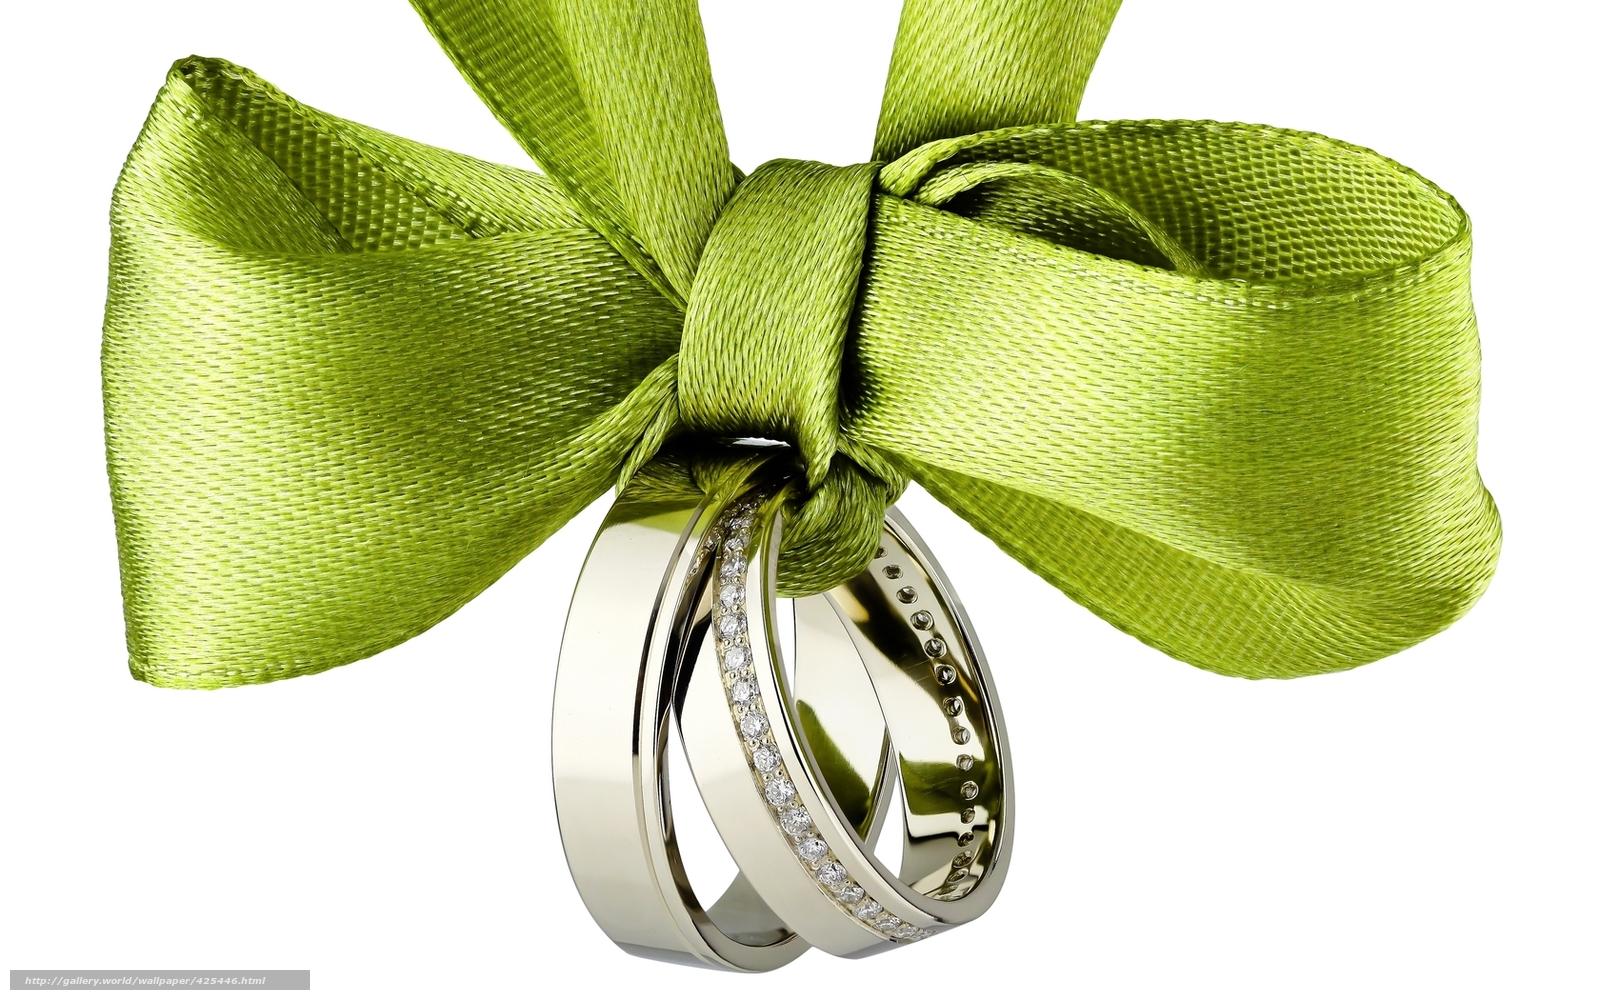 Tlcharger Fond decran ruban, arc, Anneau, anneaux de mariage Fonds d ...